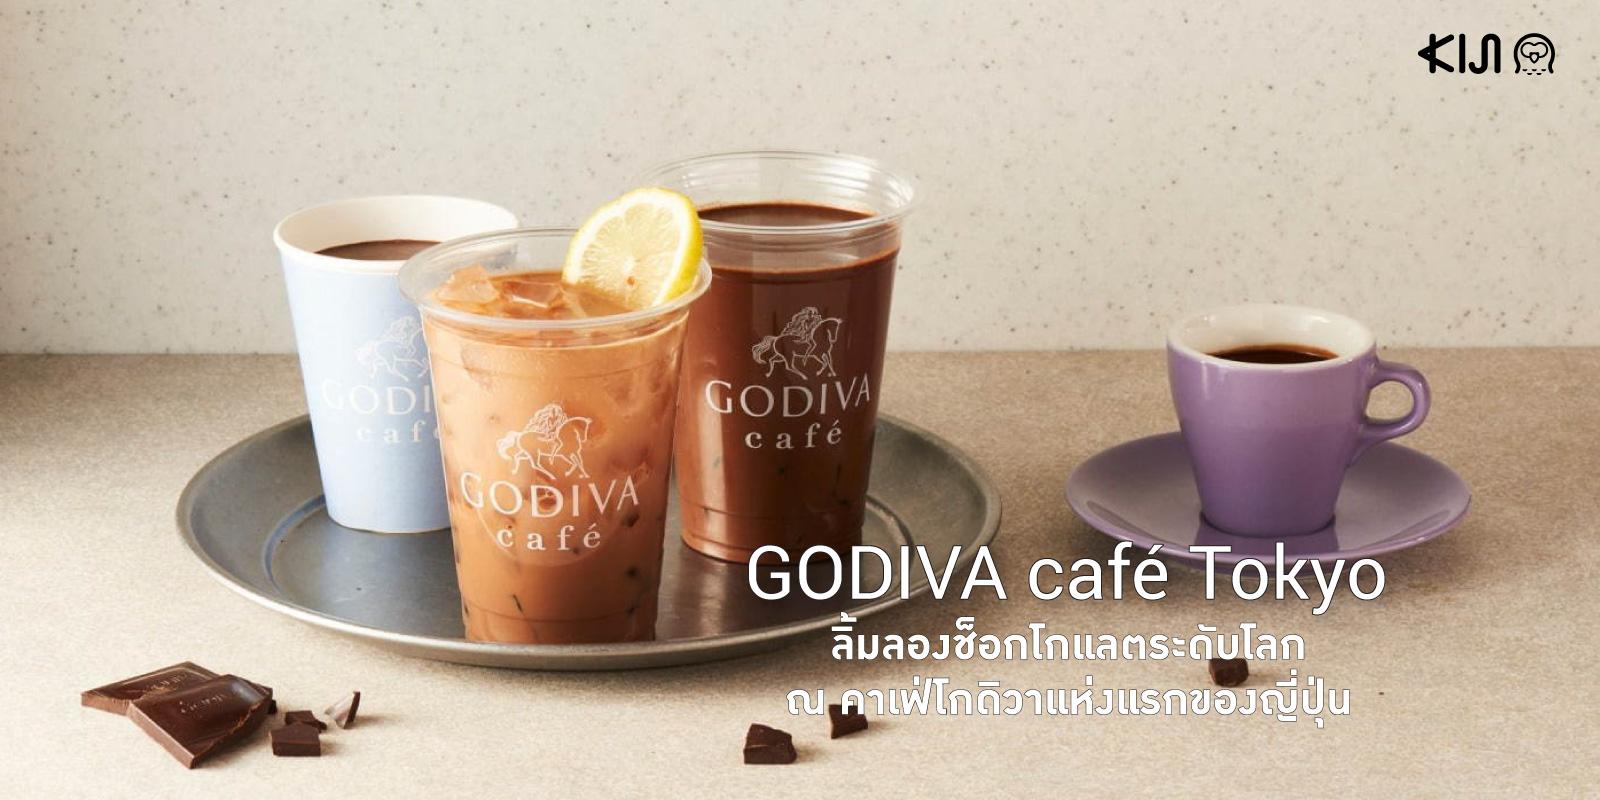 GODIVA cafe Tokyo สาขาแรกในญี่ปุ่น